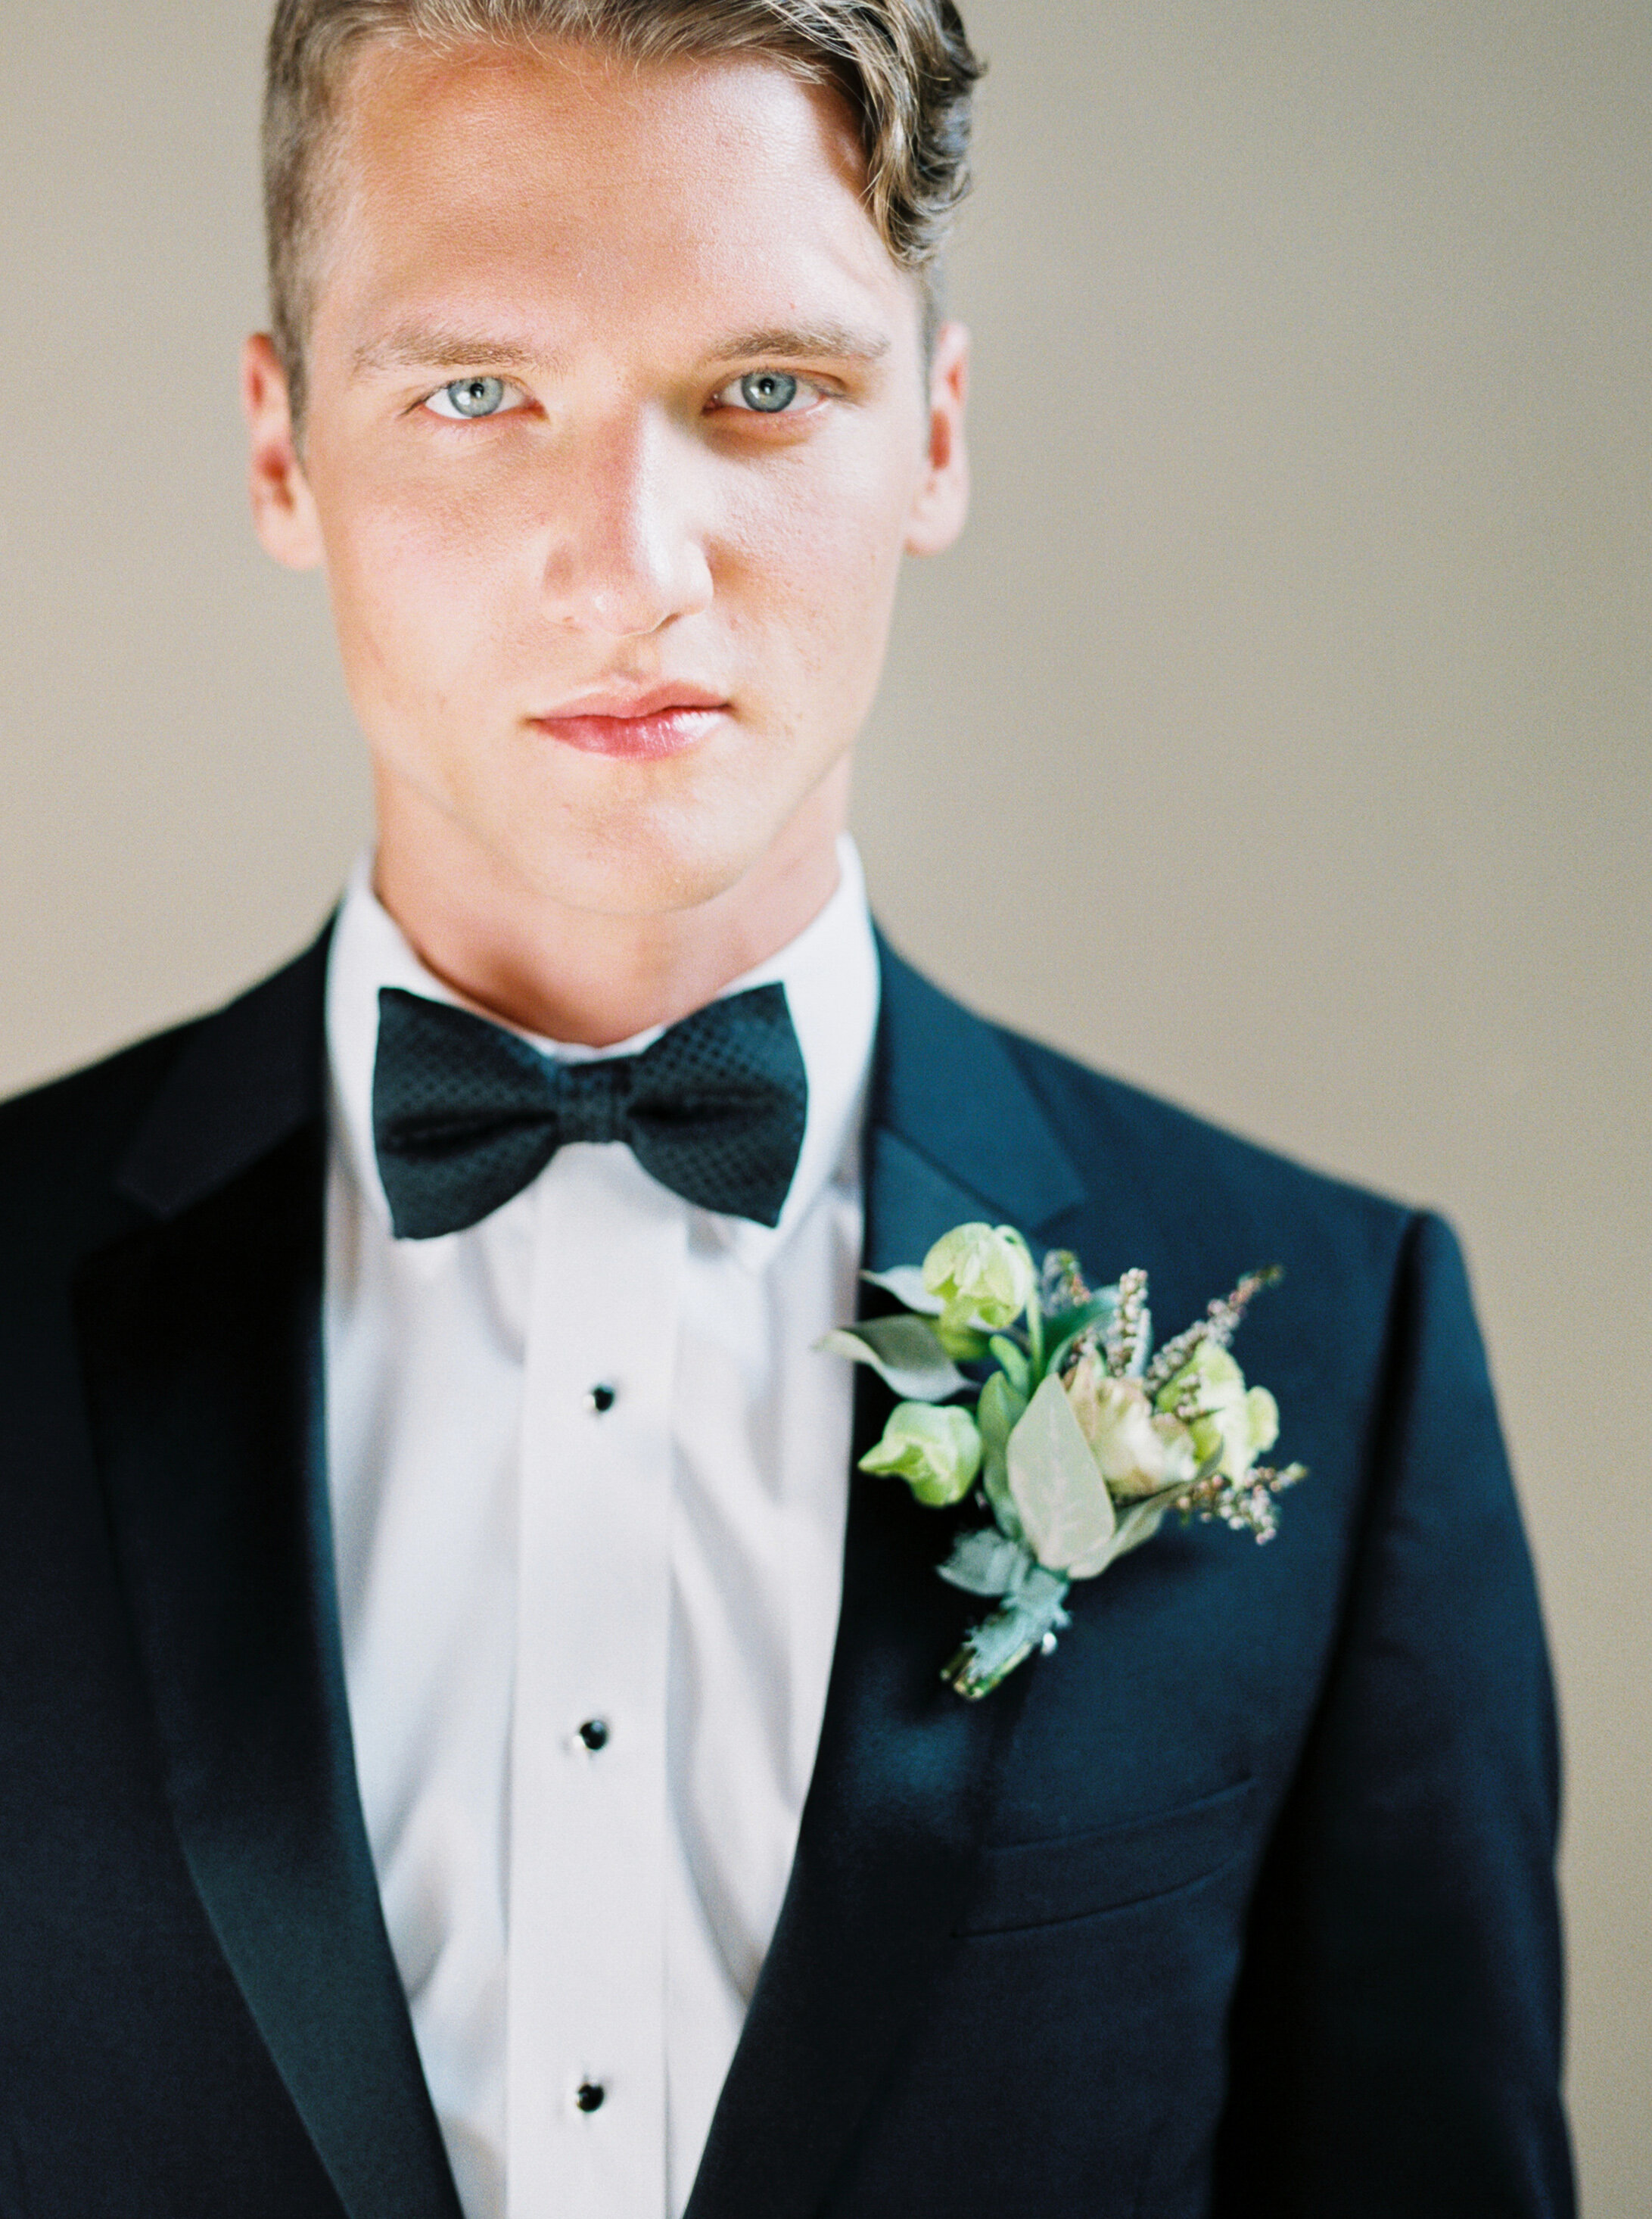 Bibb_Mill_Wedding_Editorial_Columbus_Georgia_Fallen_Photography_1 (51).JPG